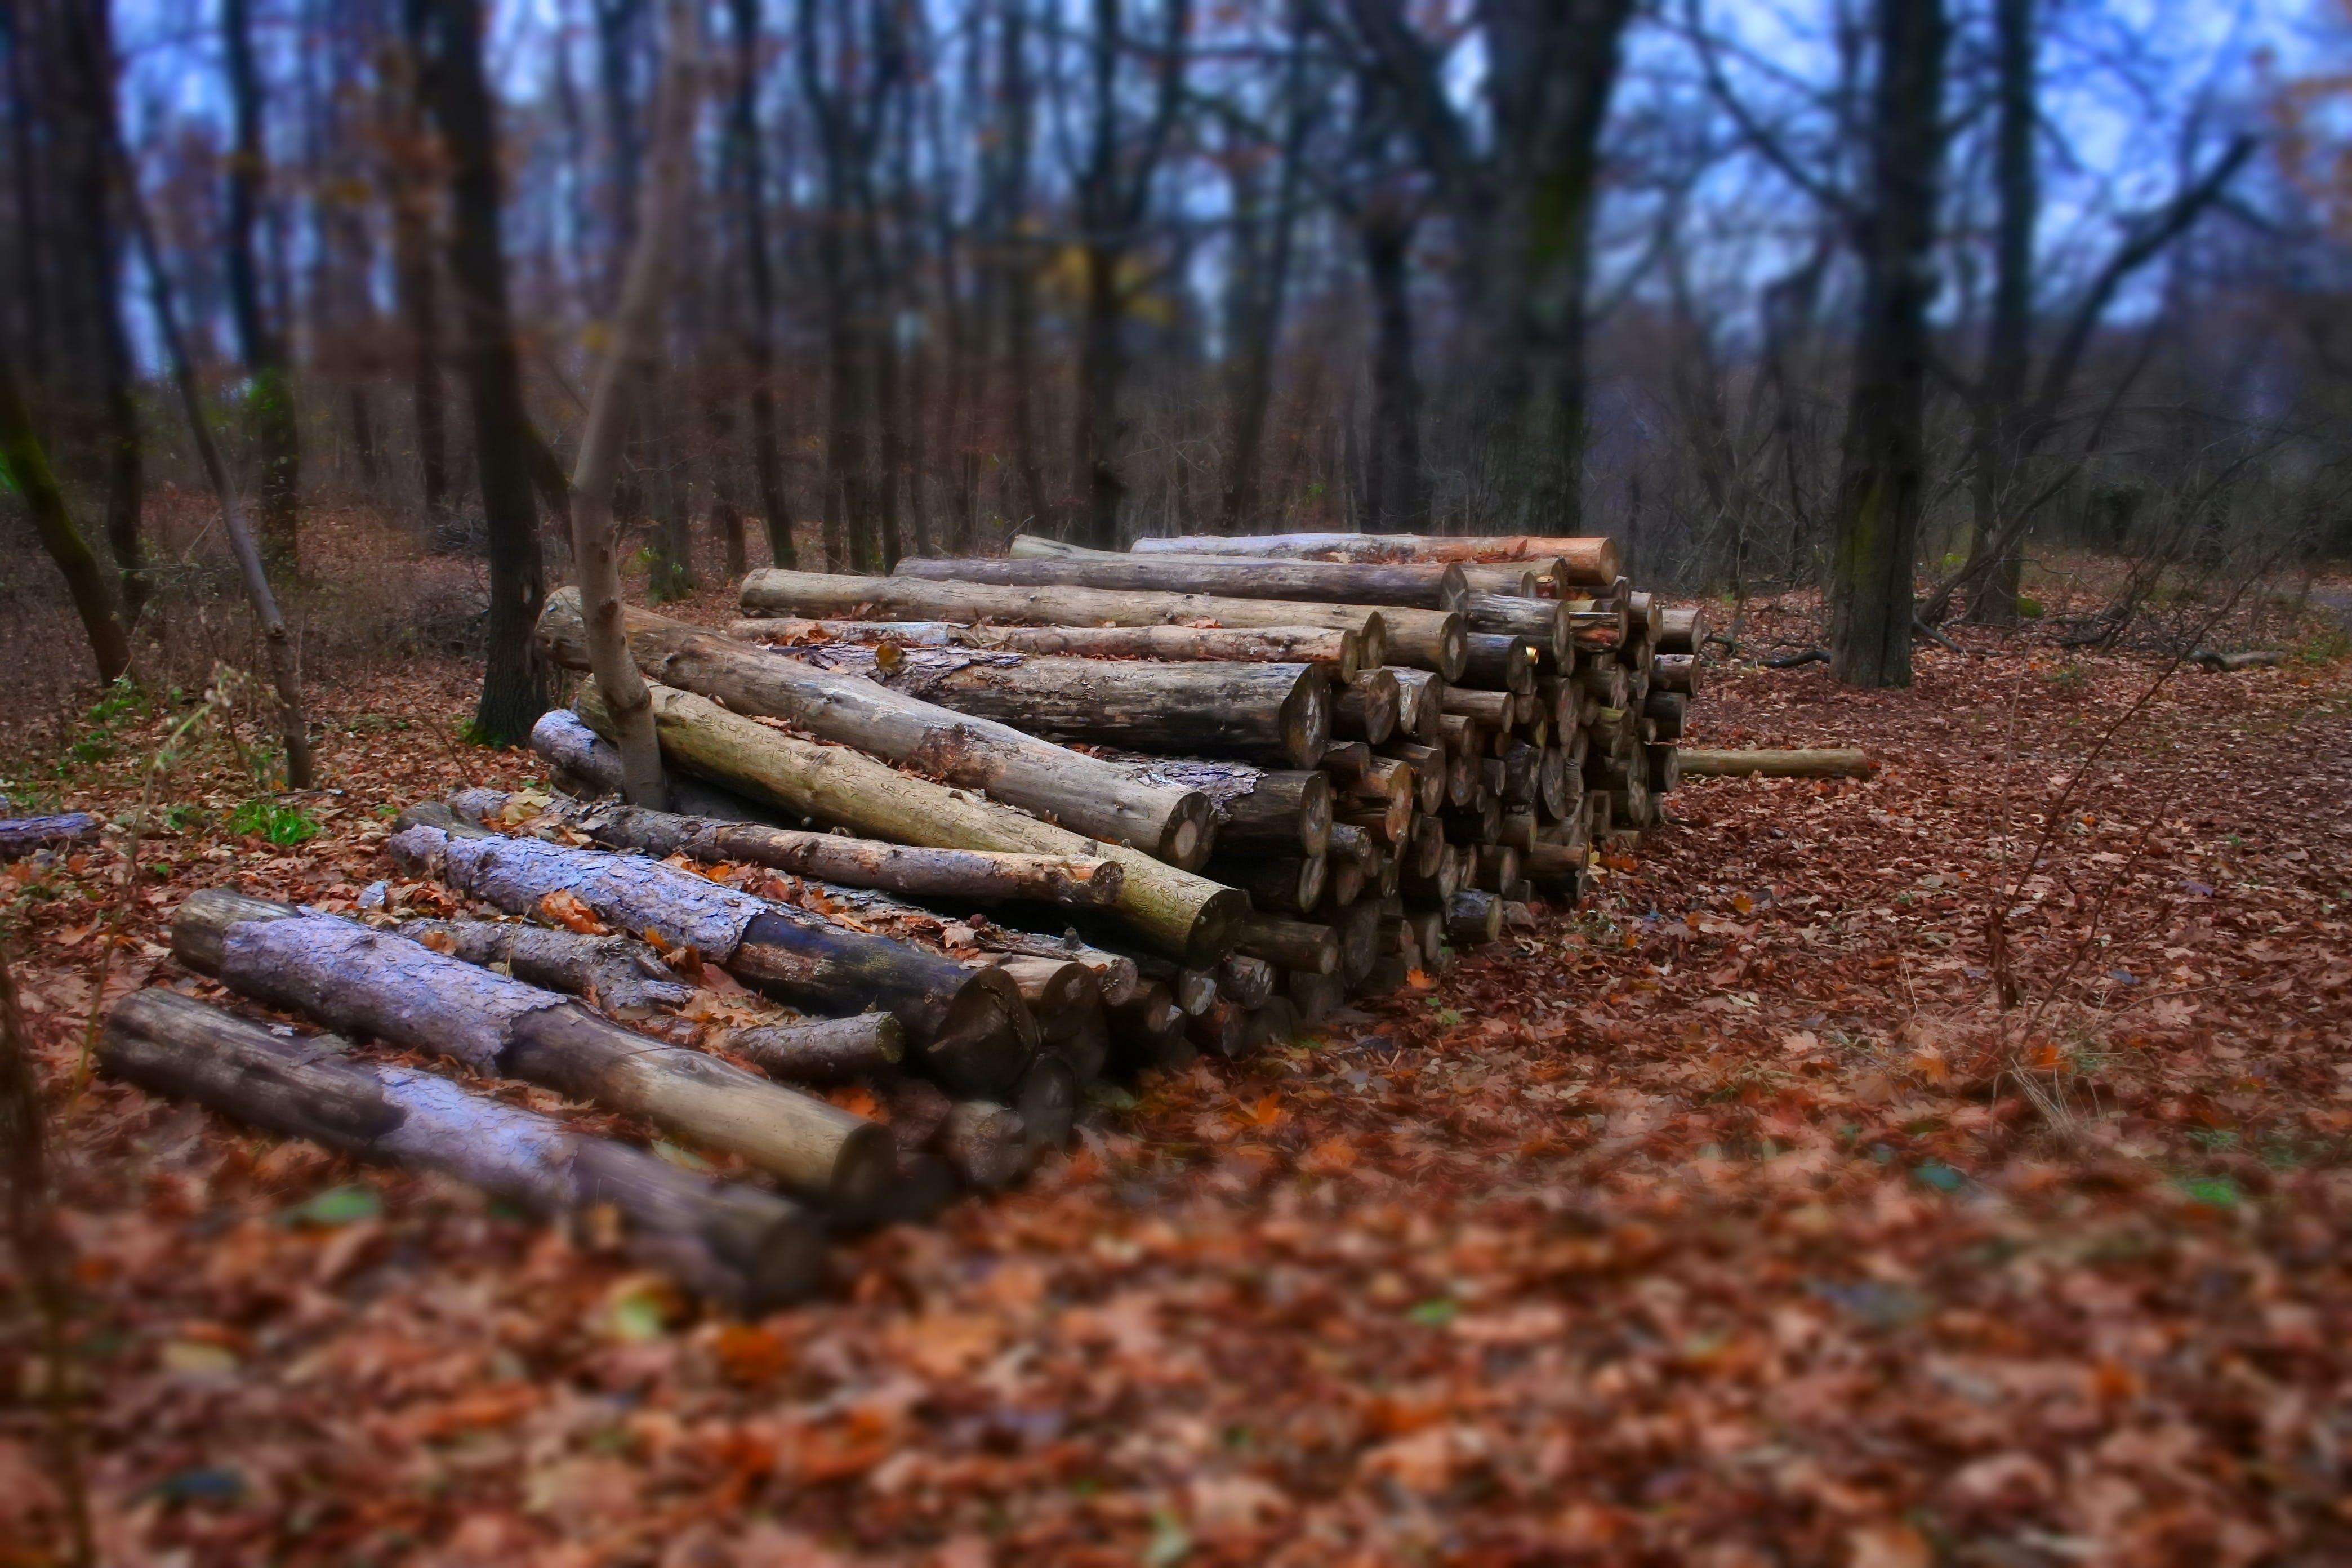 autumn, bark, blurr